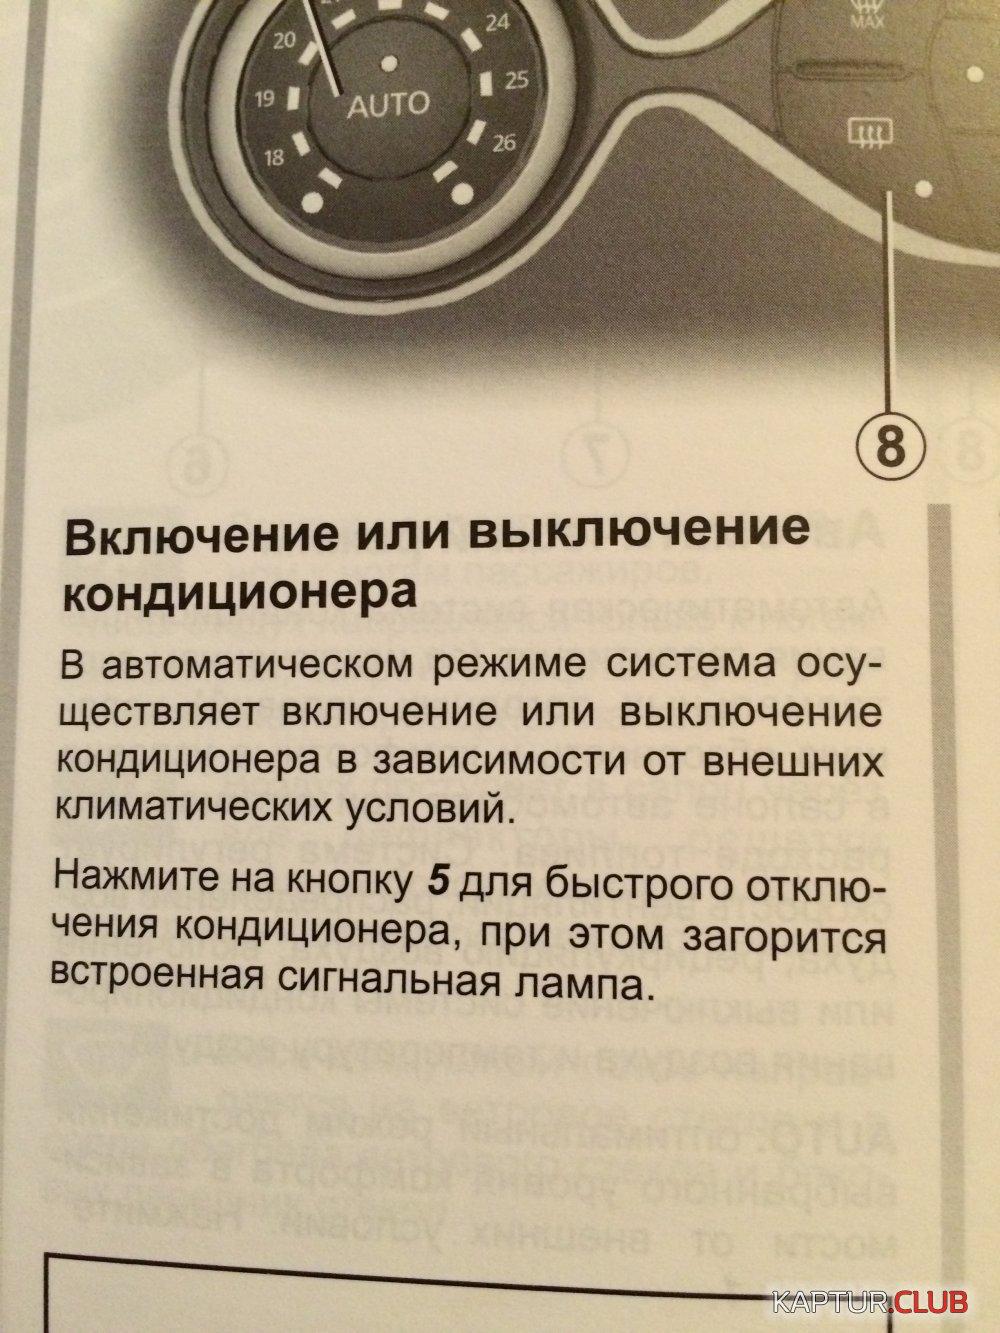 image.jpeg   Рено Каптур Клуб Россия   Форум KAPTUR.club